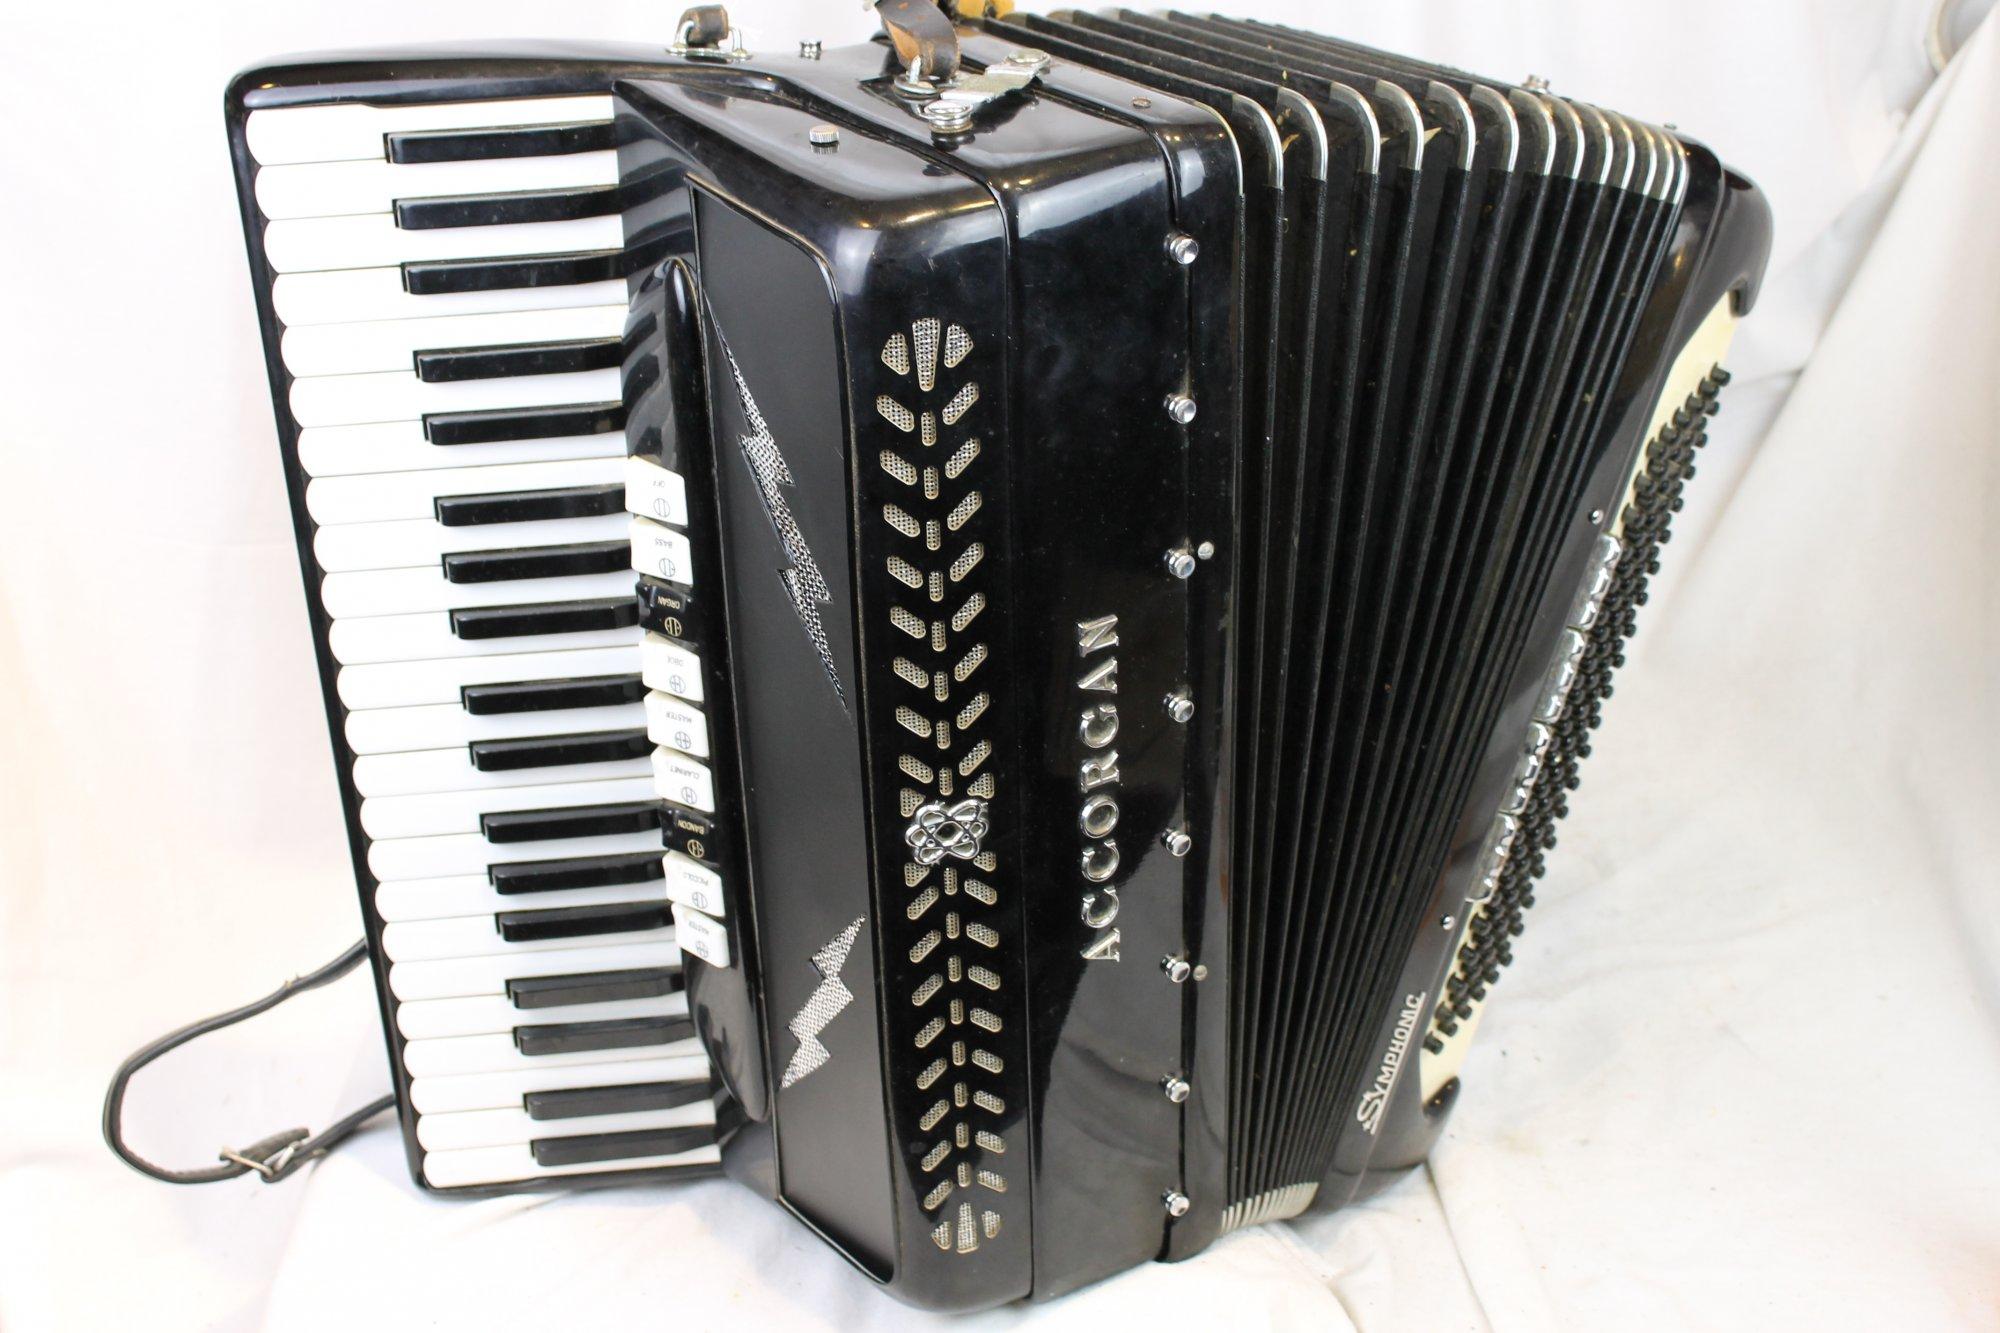 3336 - Black Iorio Accorgan Symphonic Piano Accordion LMH 41 120